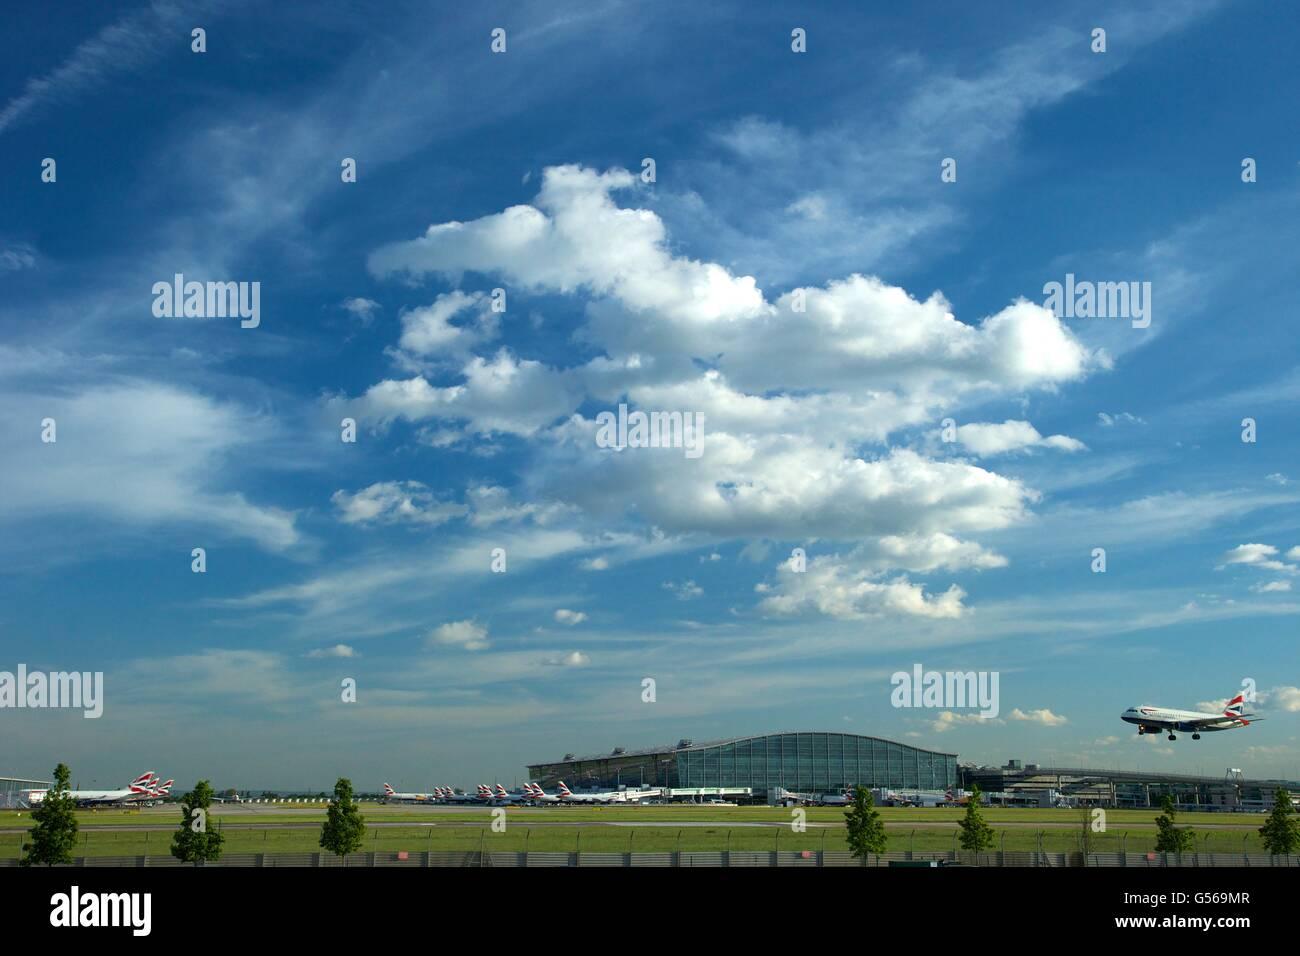 British AIrways flight landing at Heathrow Airport with Terminal 5 behind, London, England, UK, GB, - Stock Image